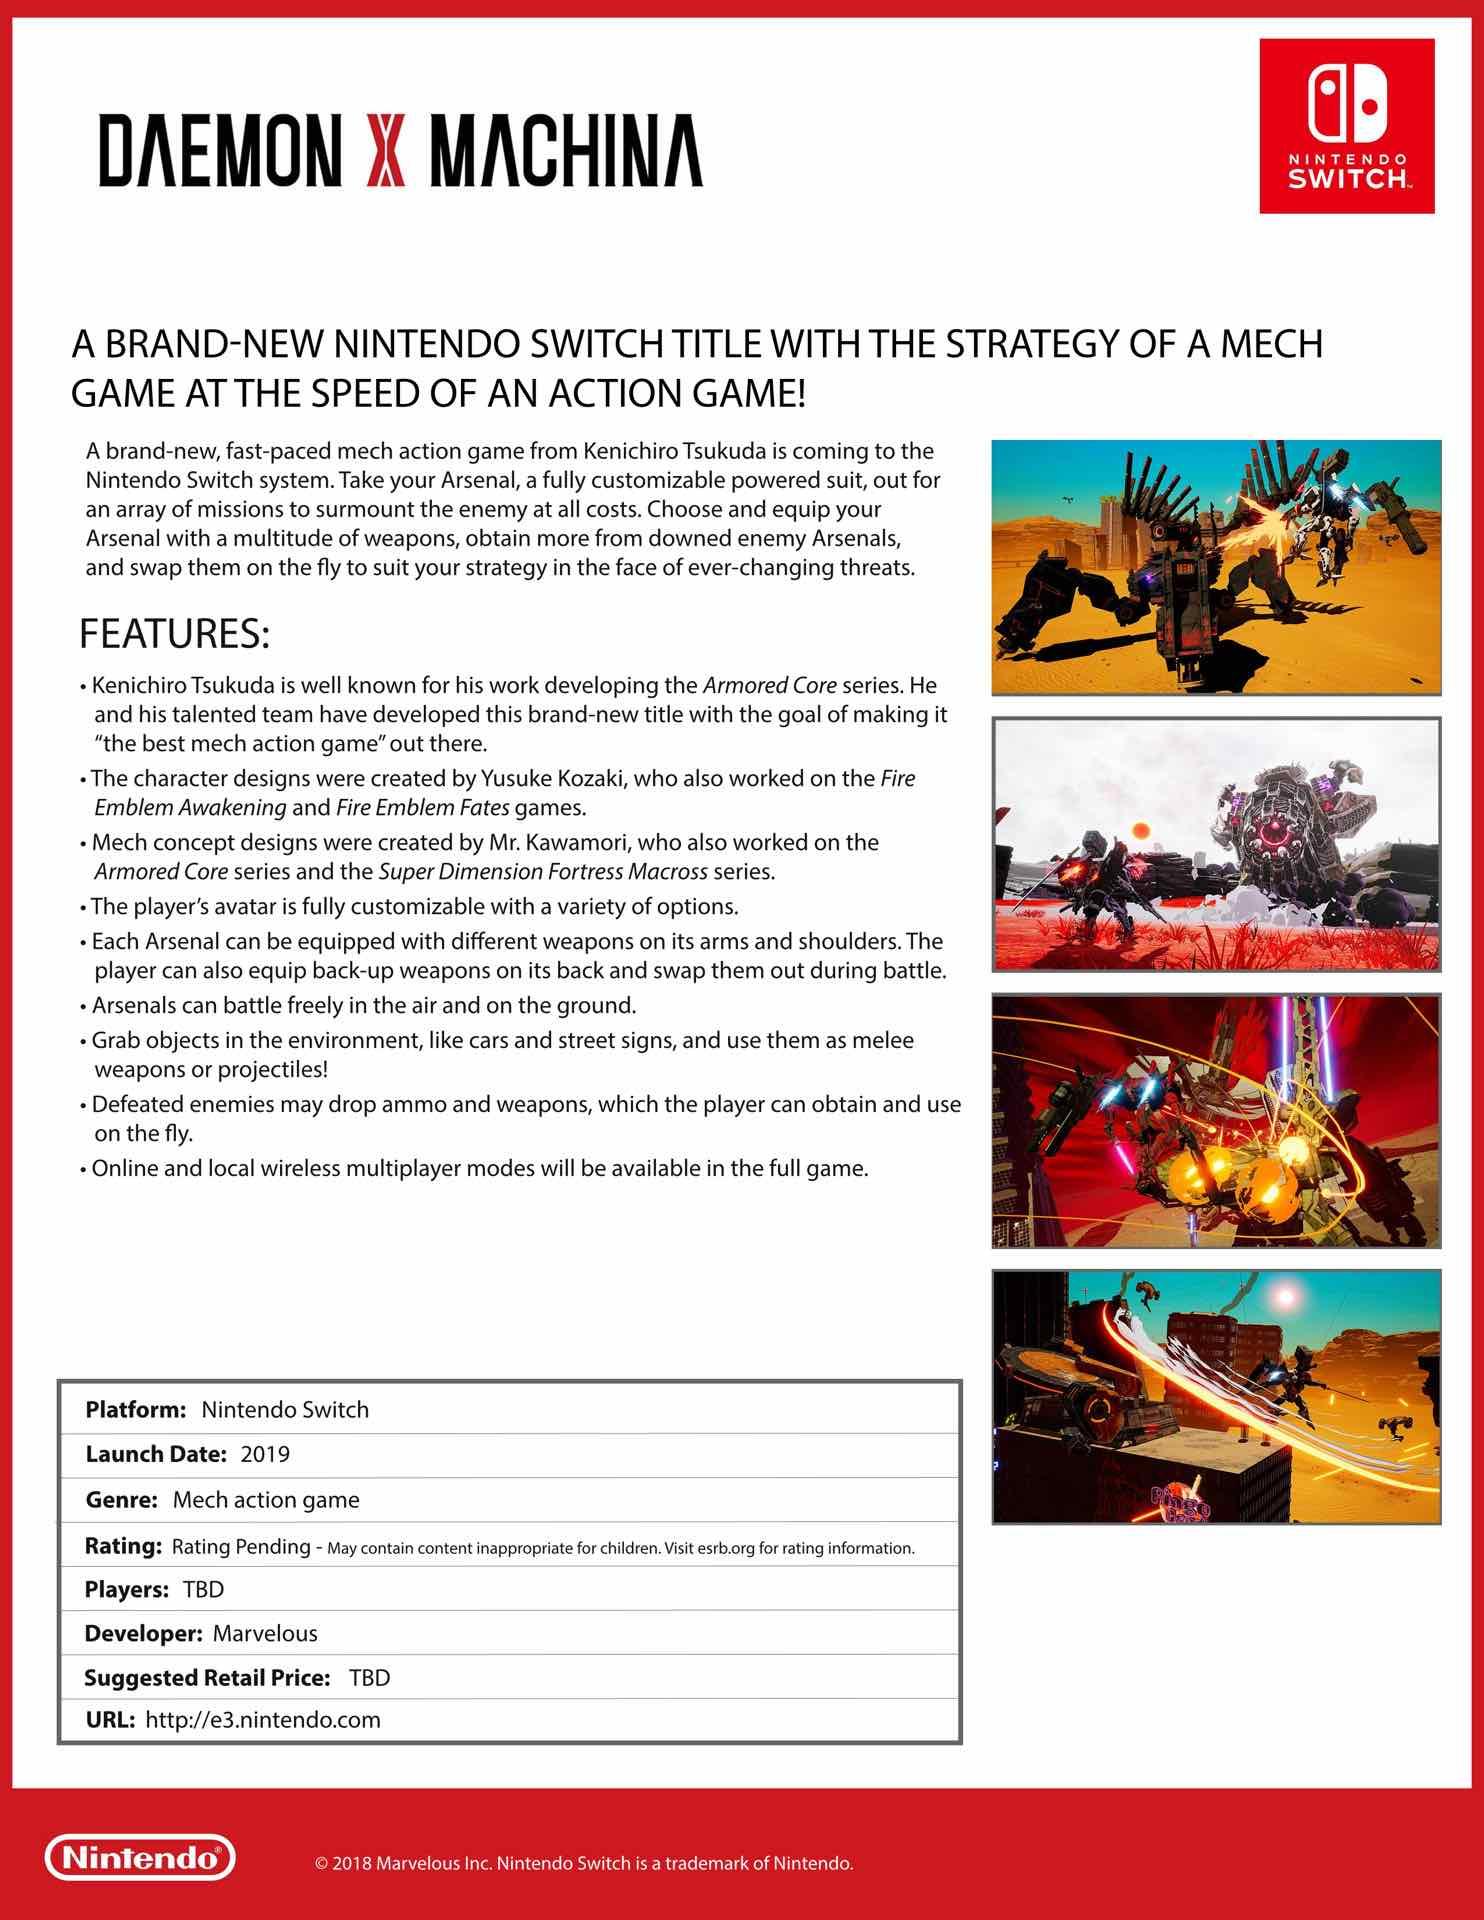 E32018-Factsheet-DaemonXMachina-Switch-ver2-2